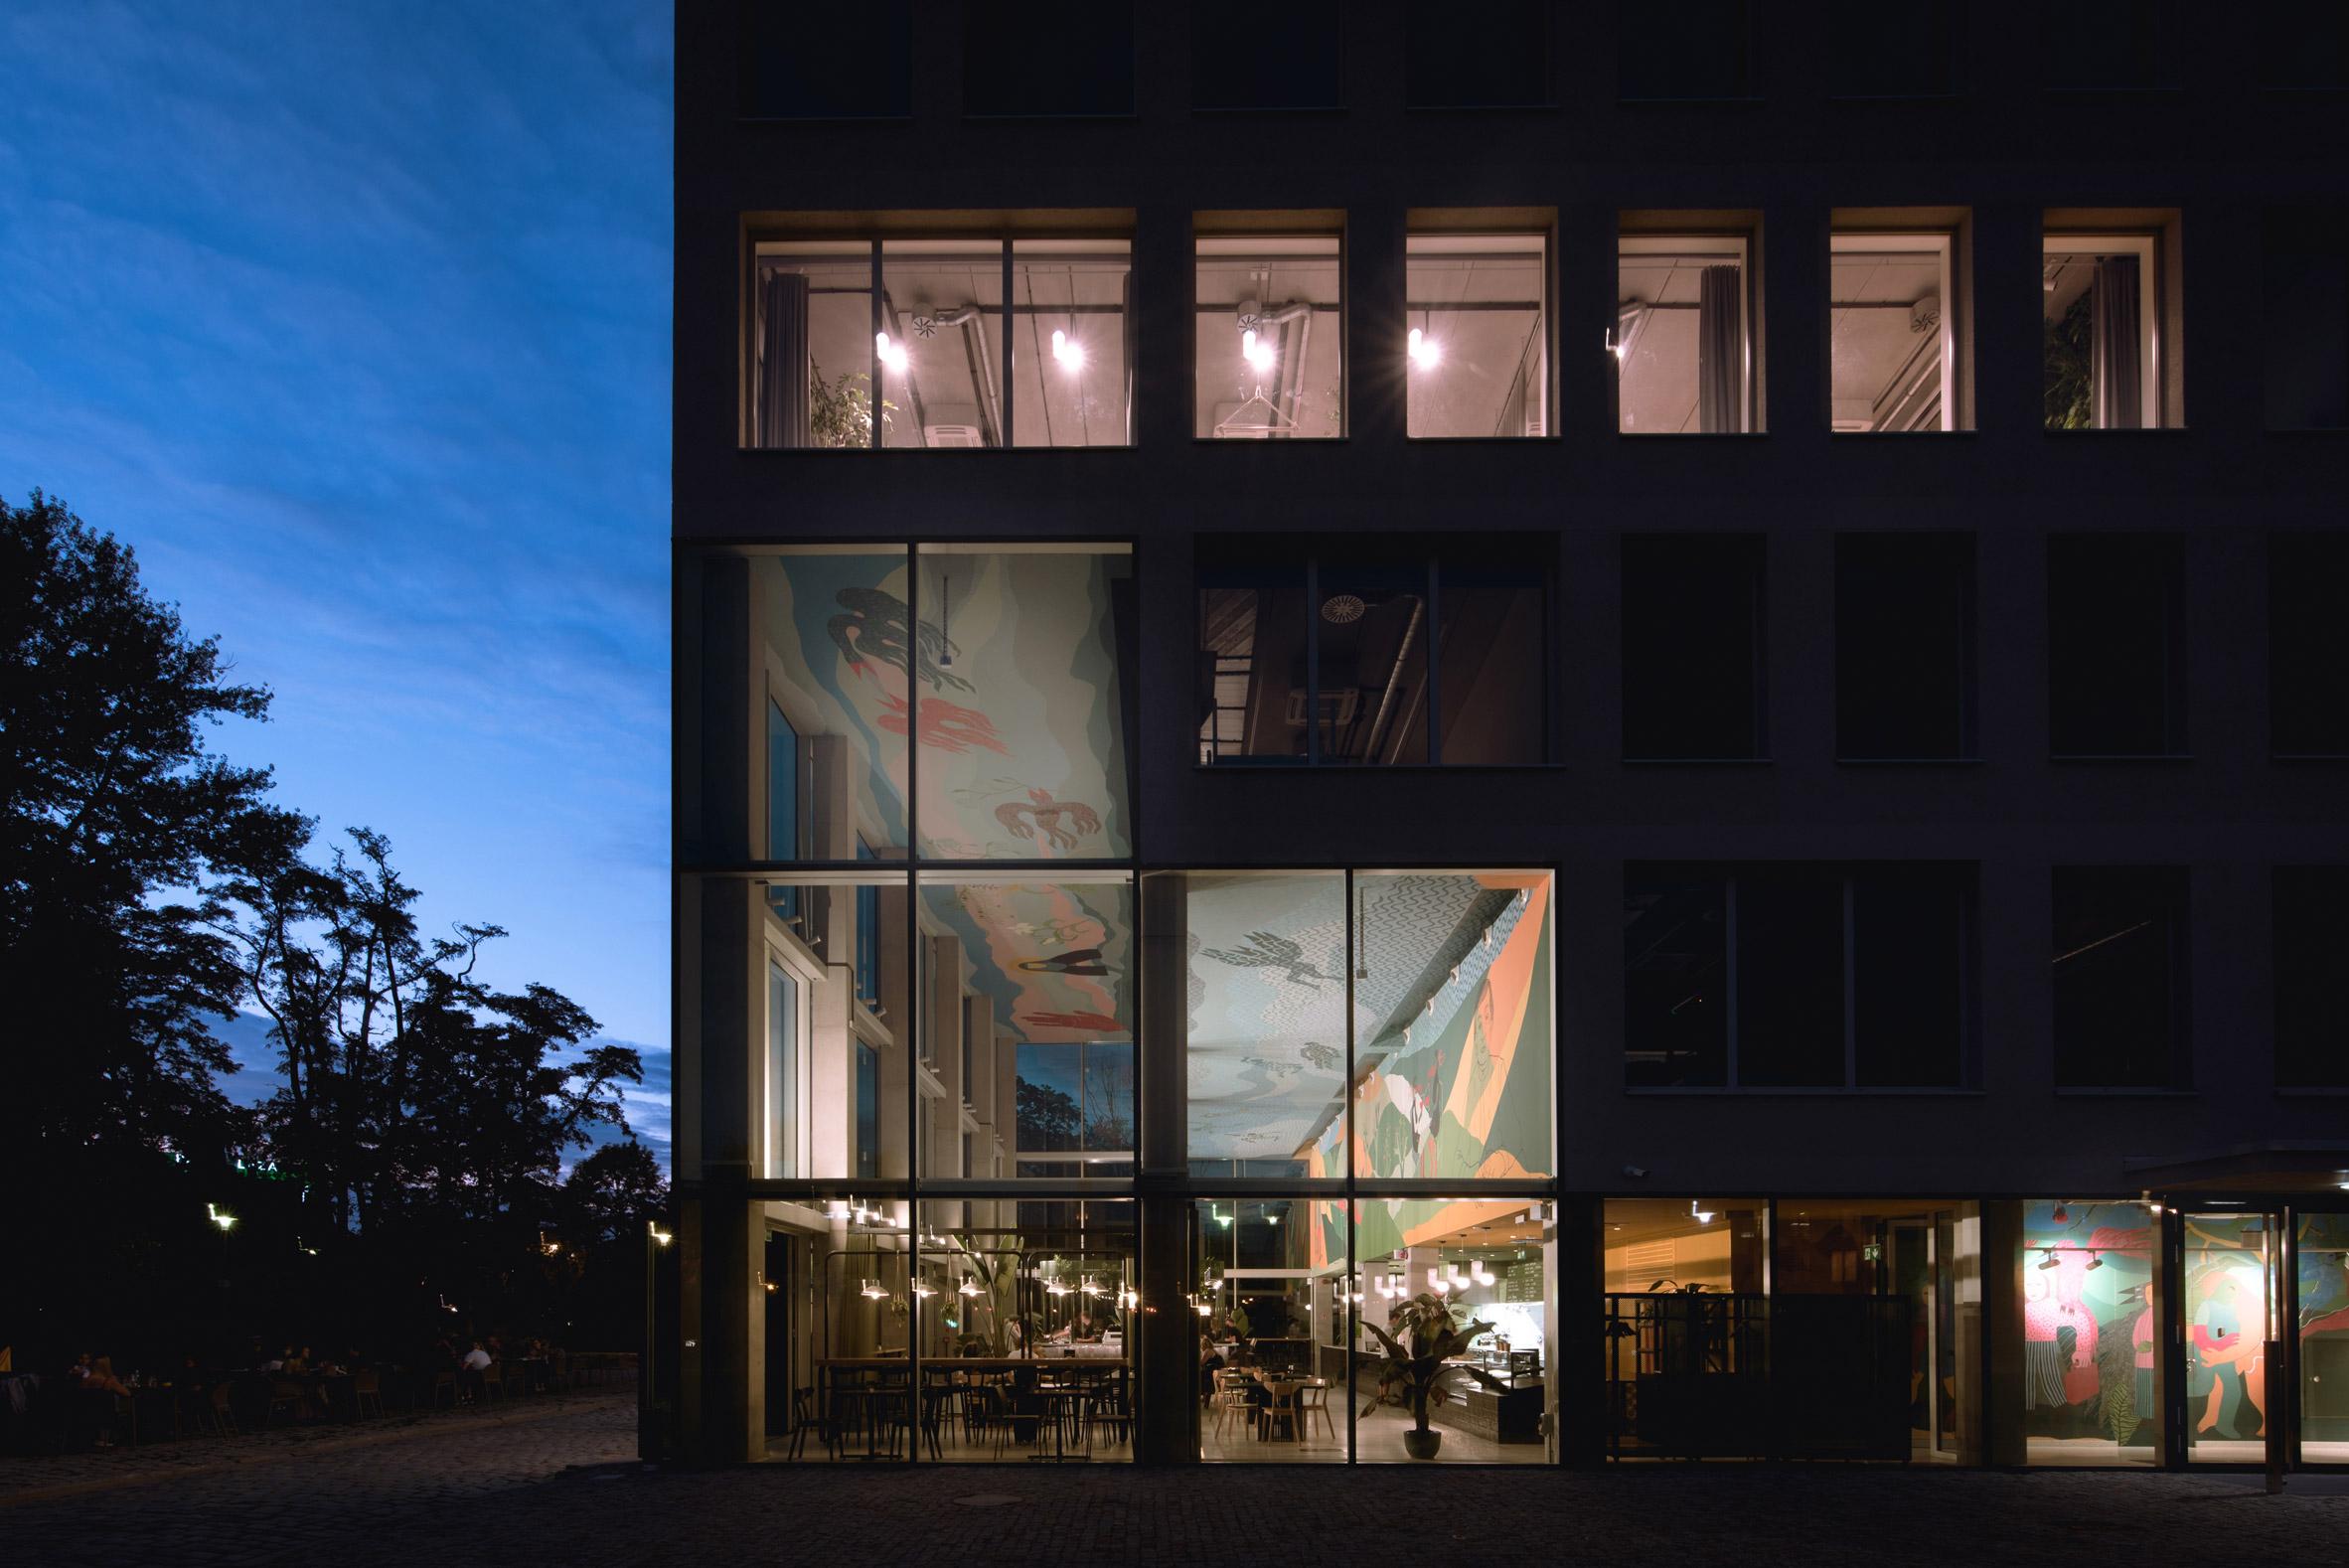 Concordia Design by MVRDV and Alicja Biala at night